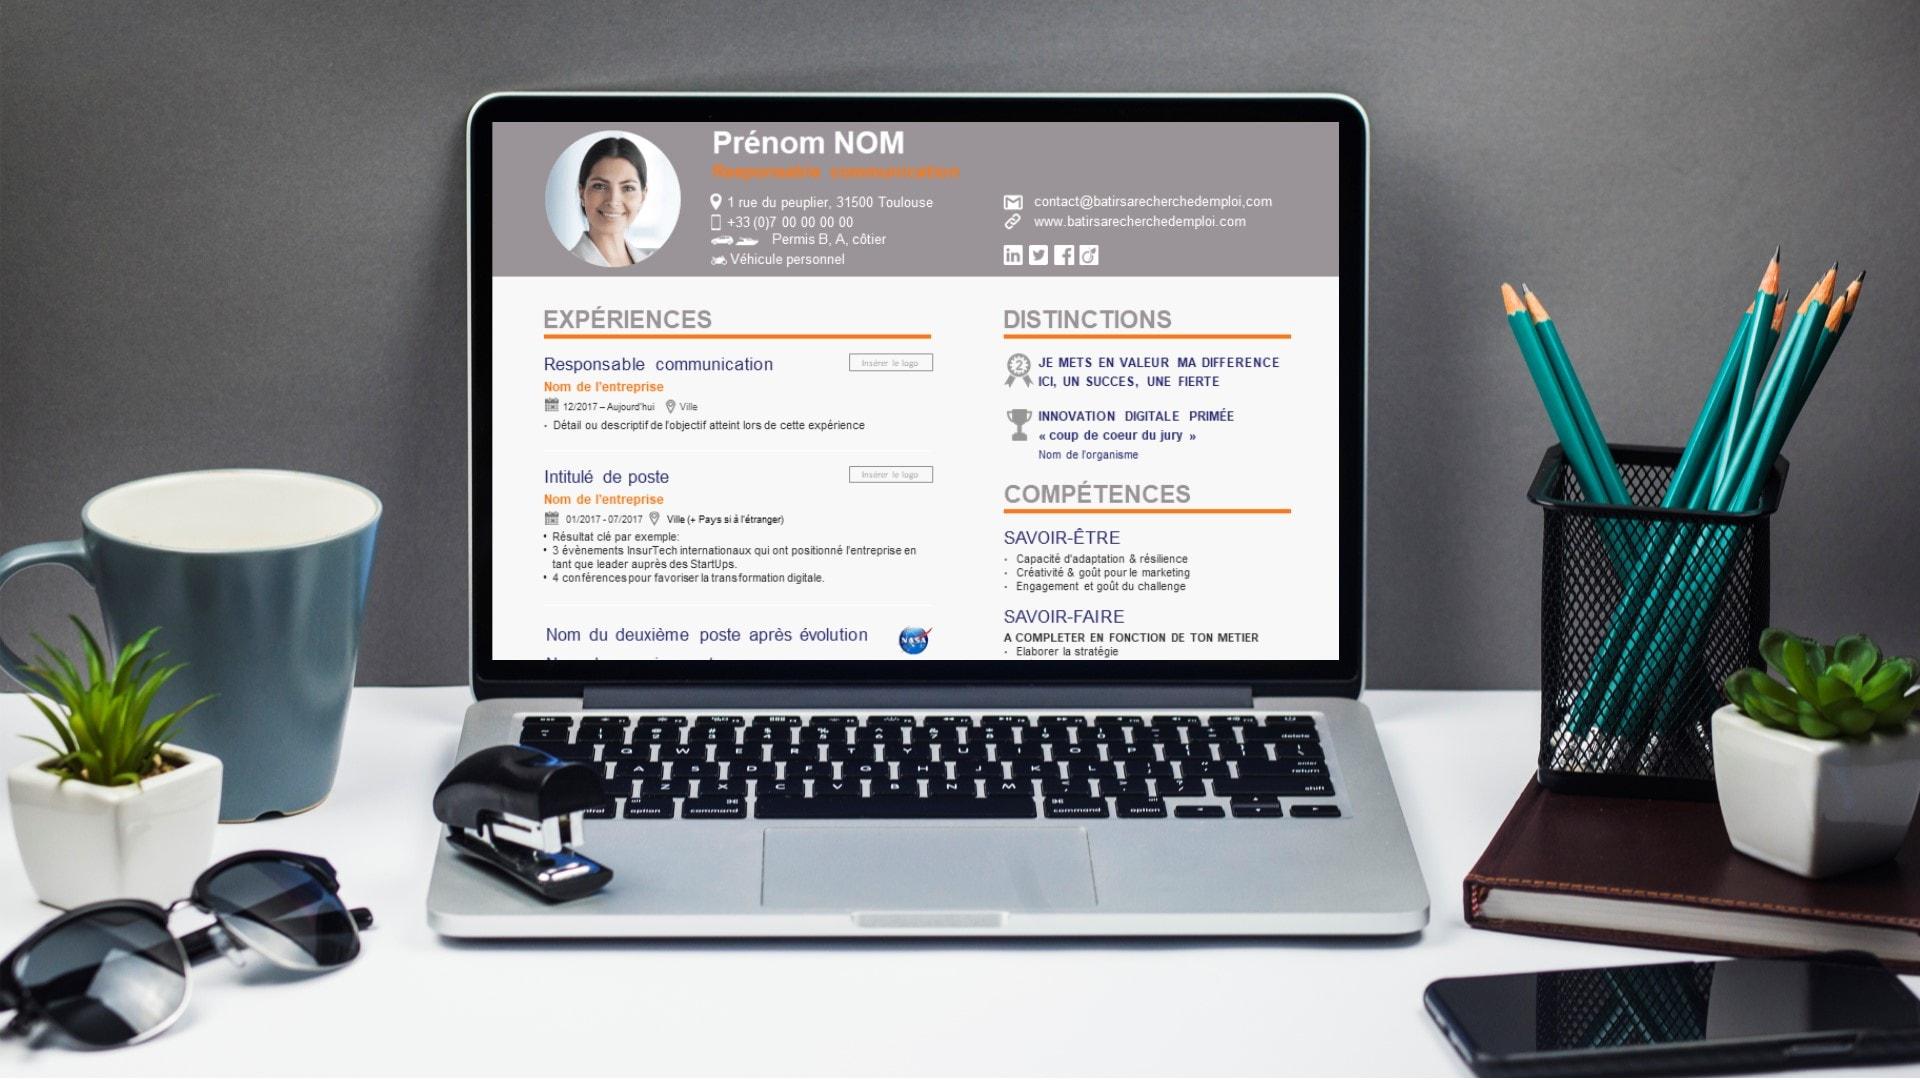 Ajouter un CV sur LinkedIn - Tutoriel LinkedIn